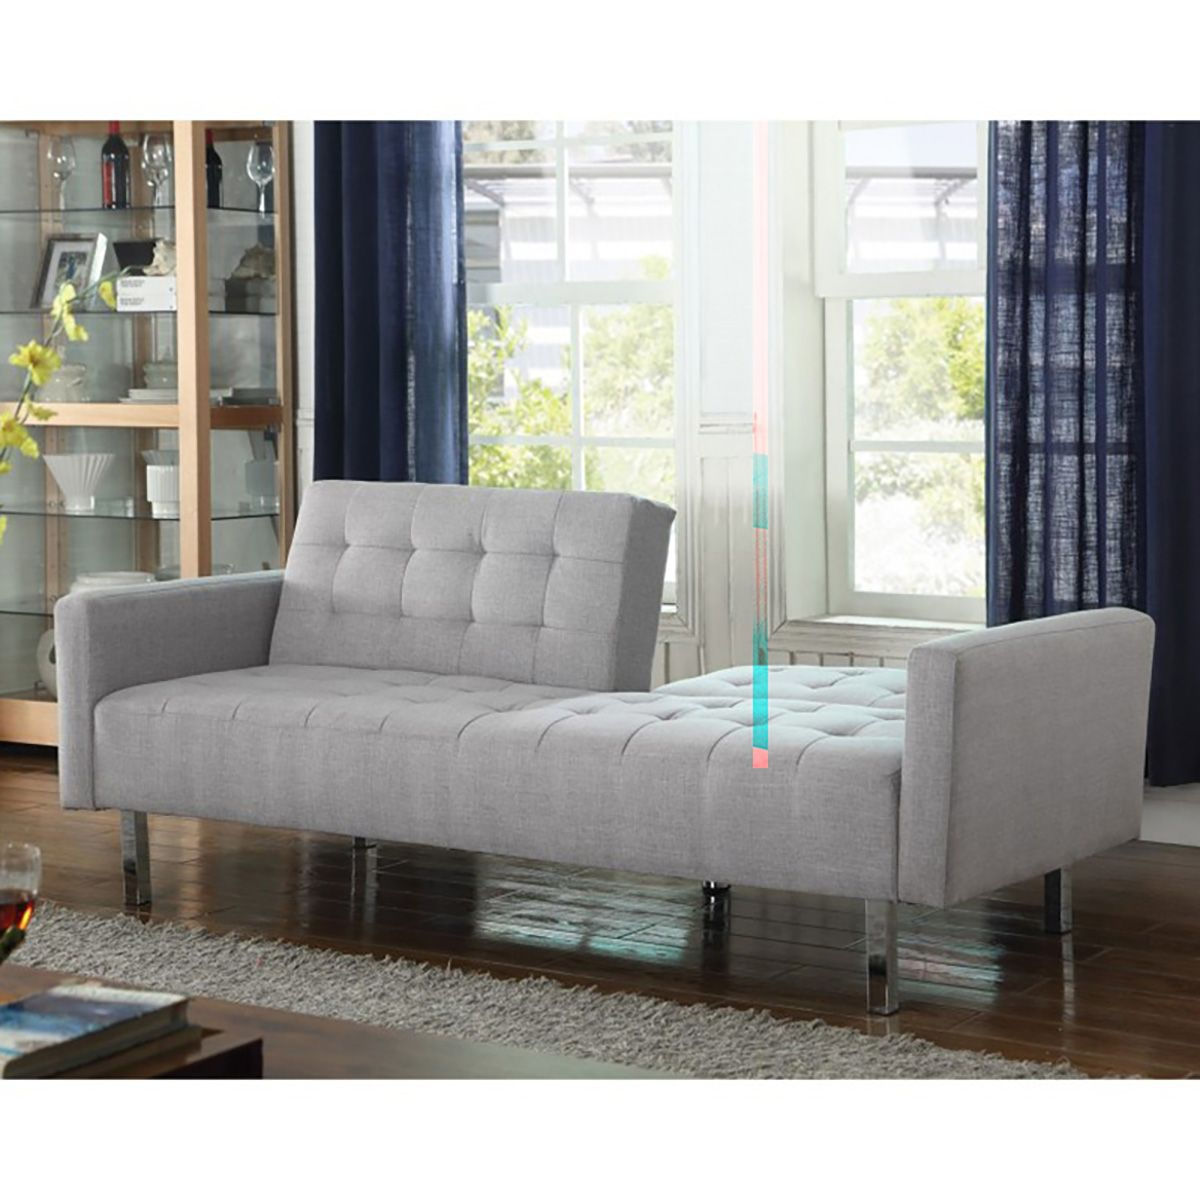 Furniture Sofa Bed Fabric